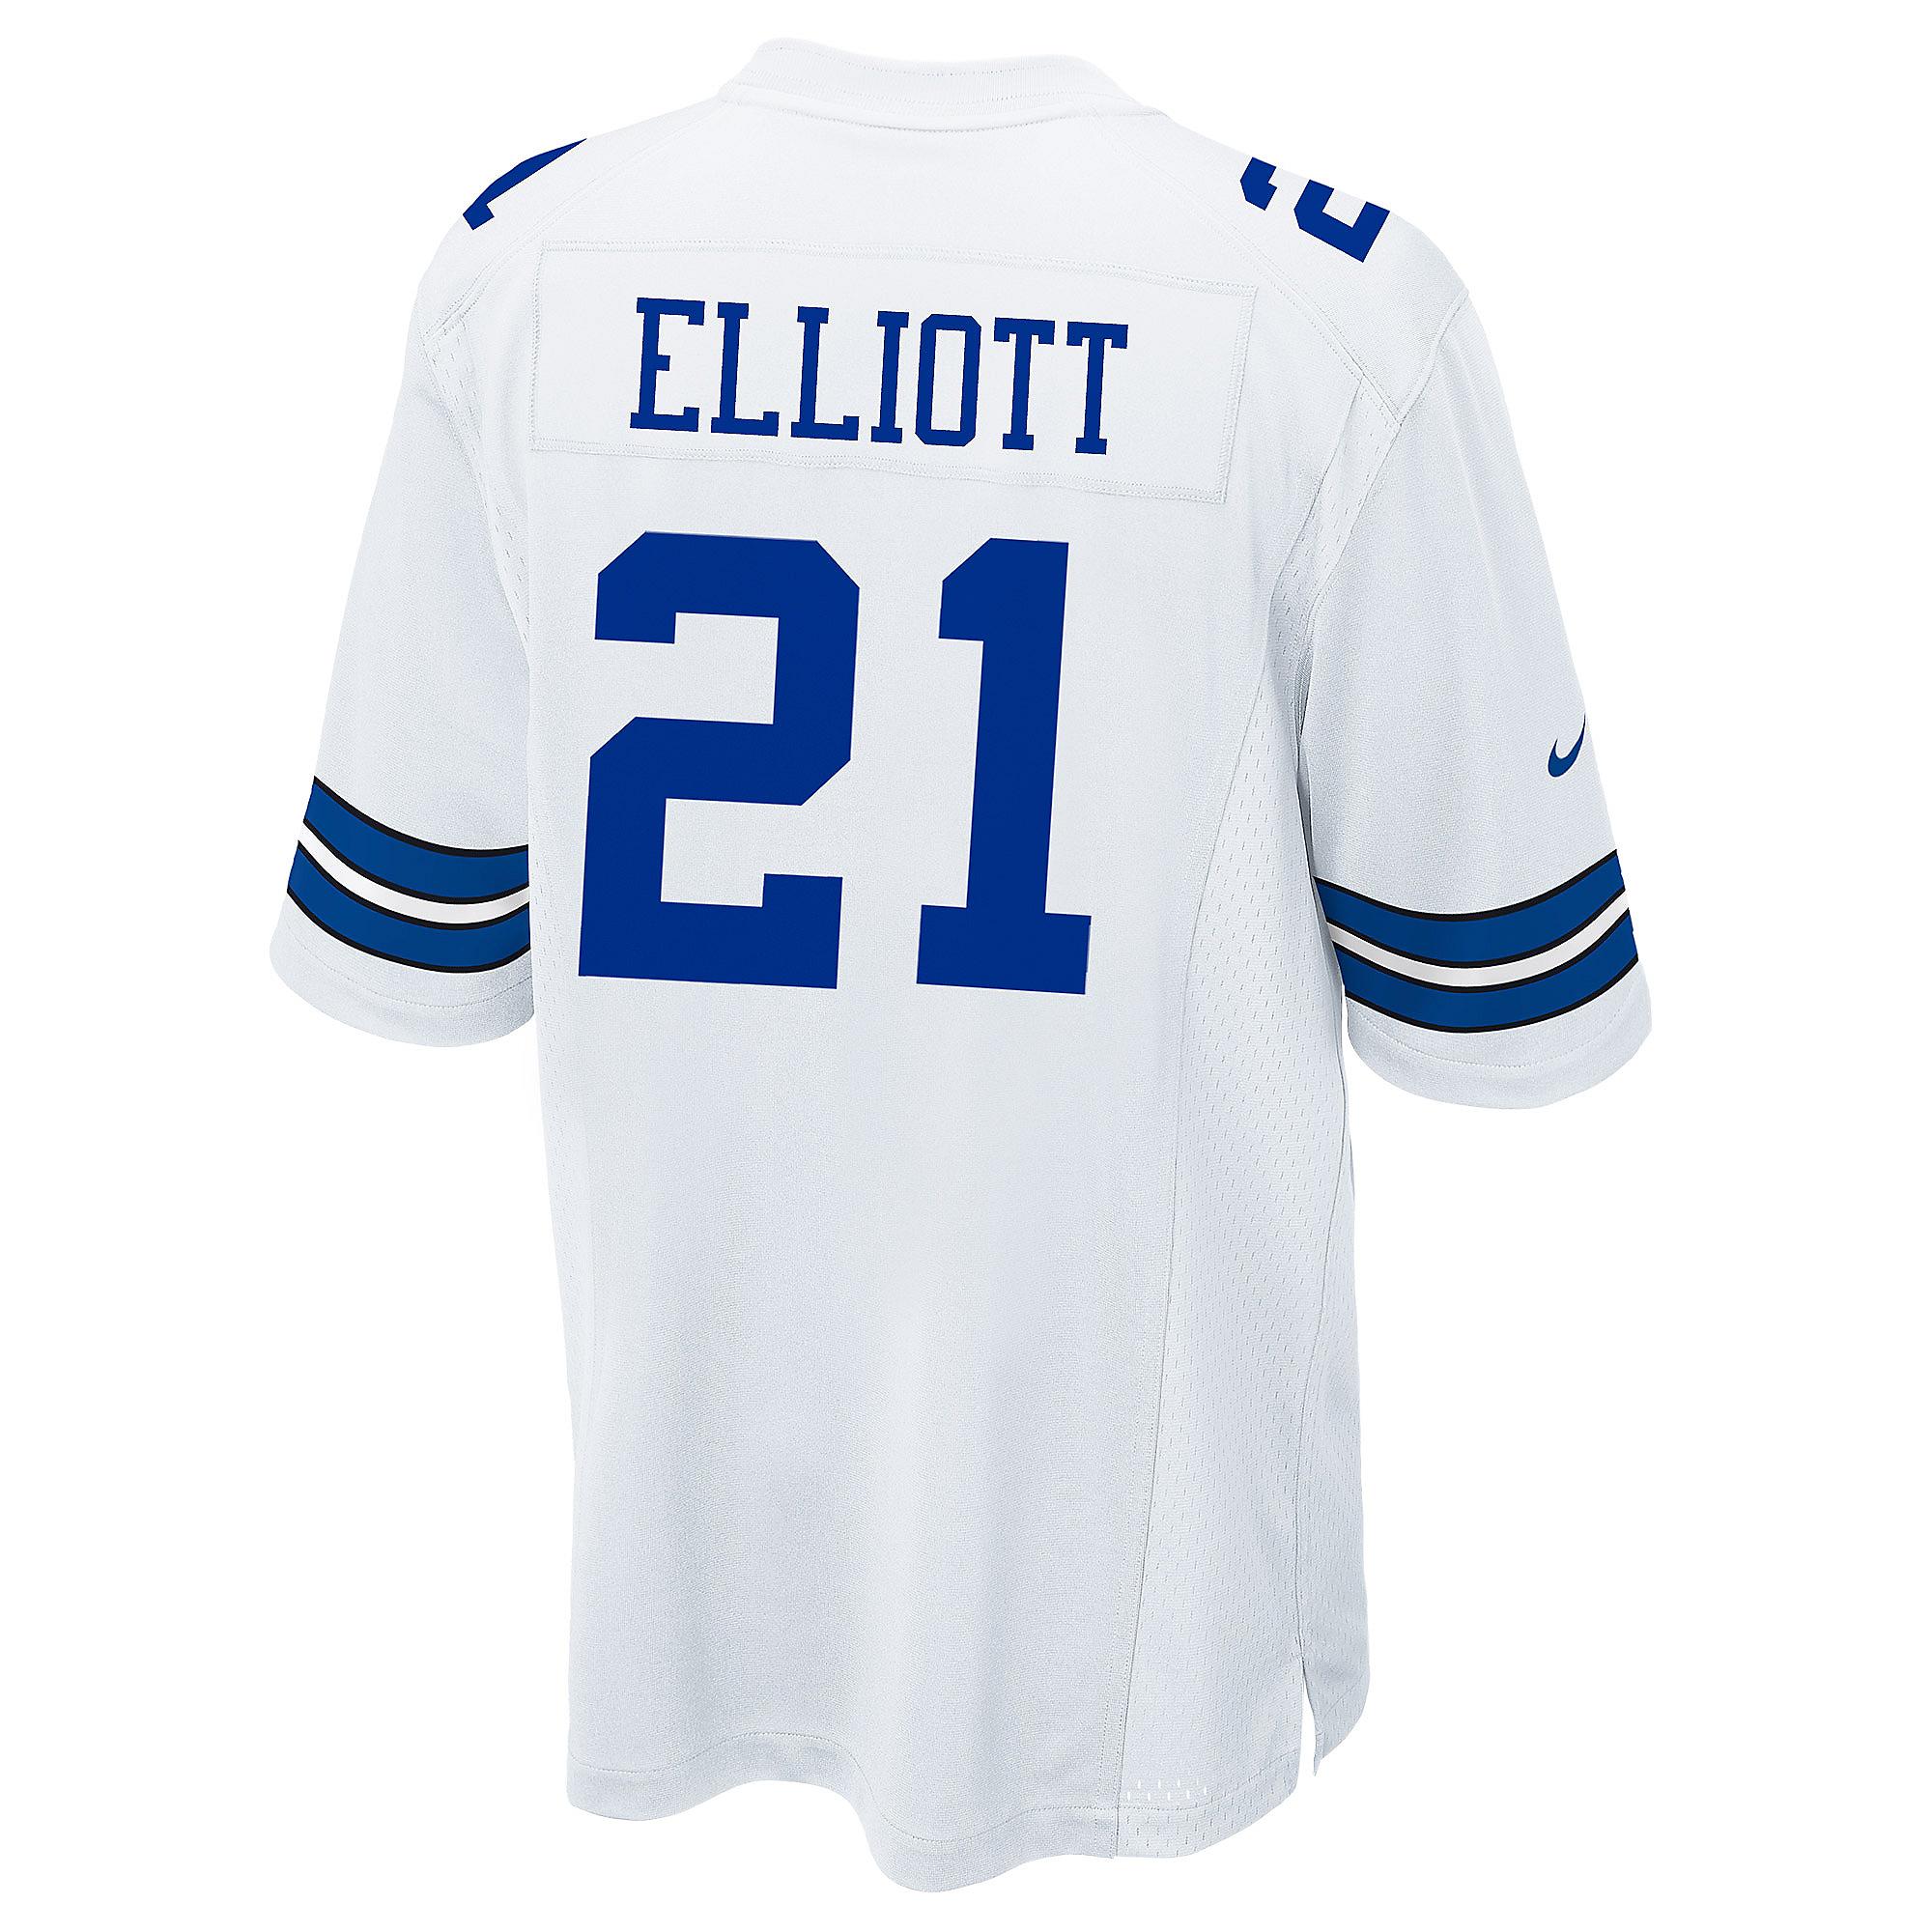 f3404d71 Dallas Cowboys Ezekiel Elliott Nike White Game Replica Jersey ...